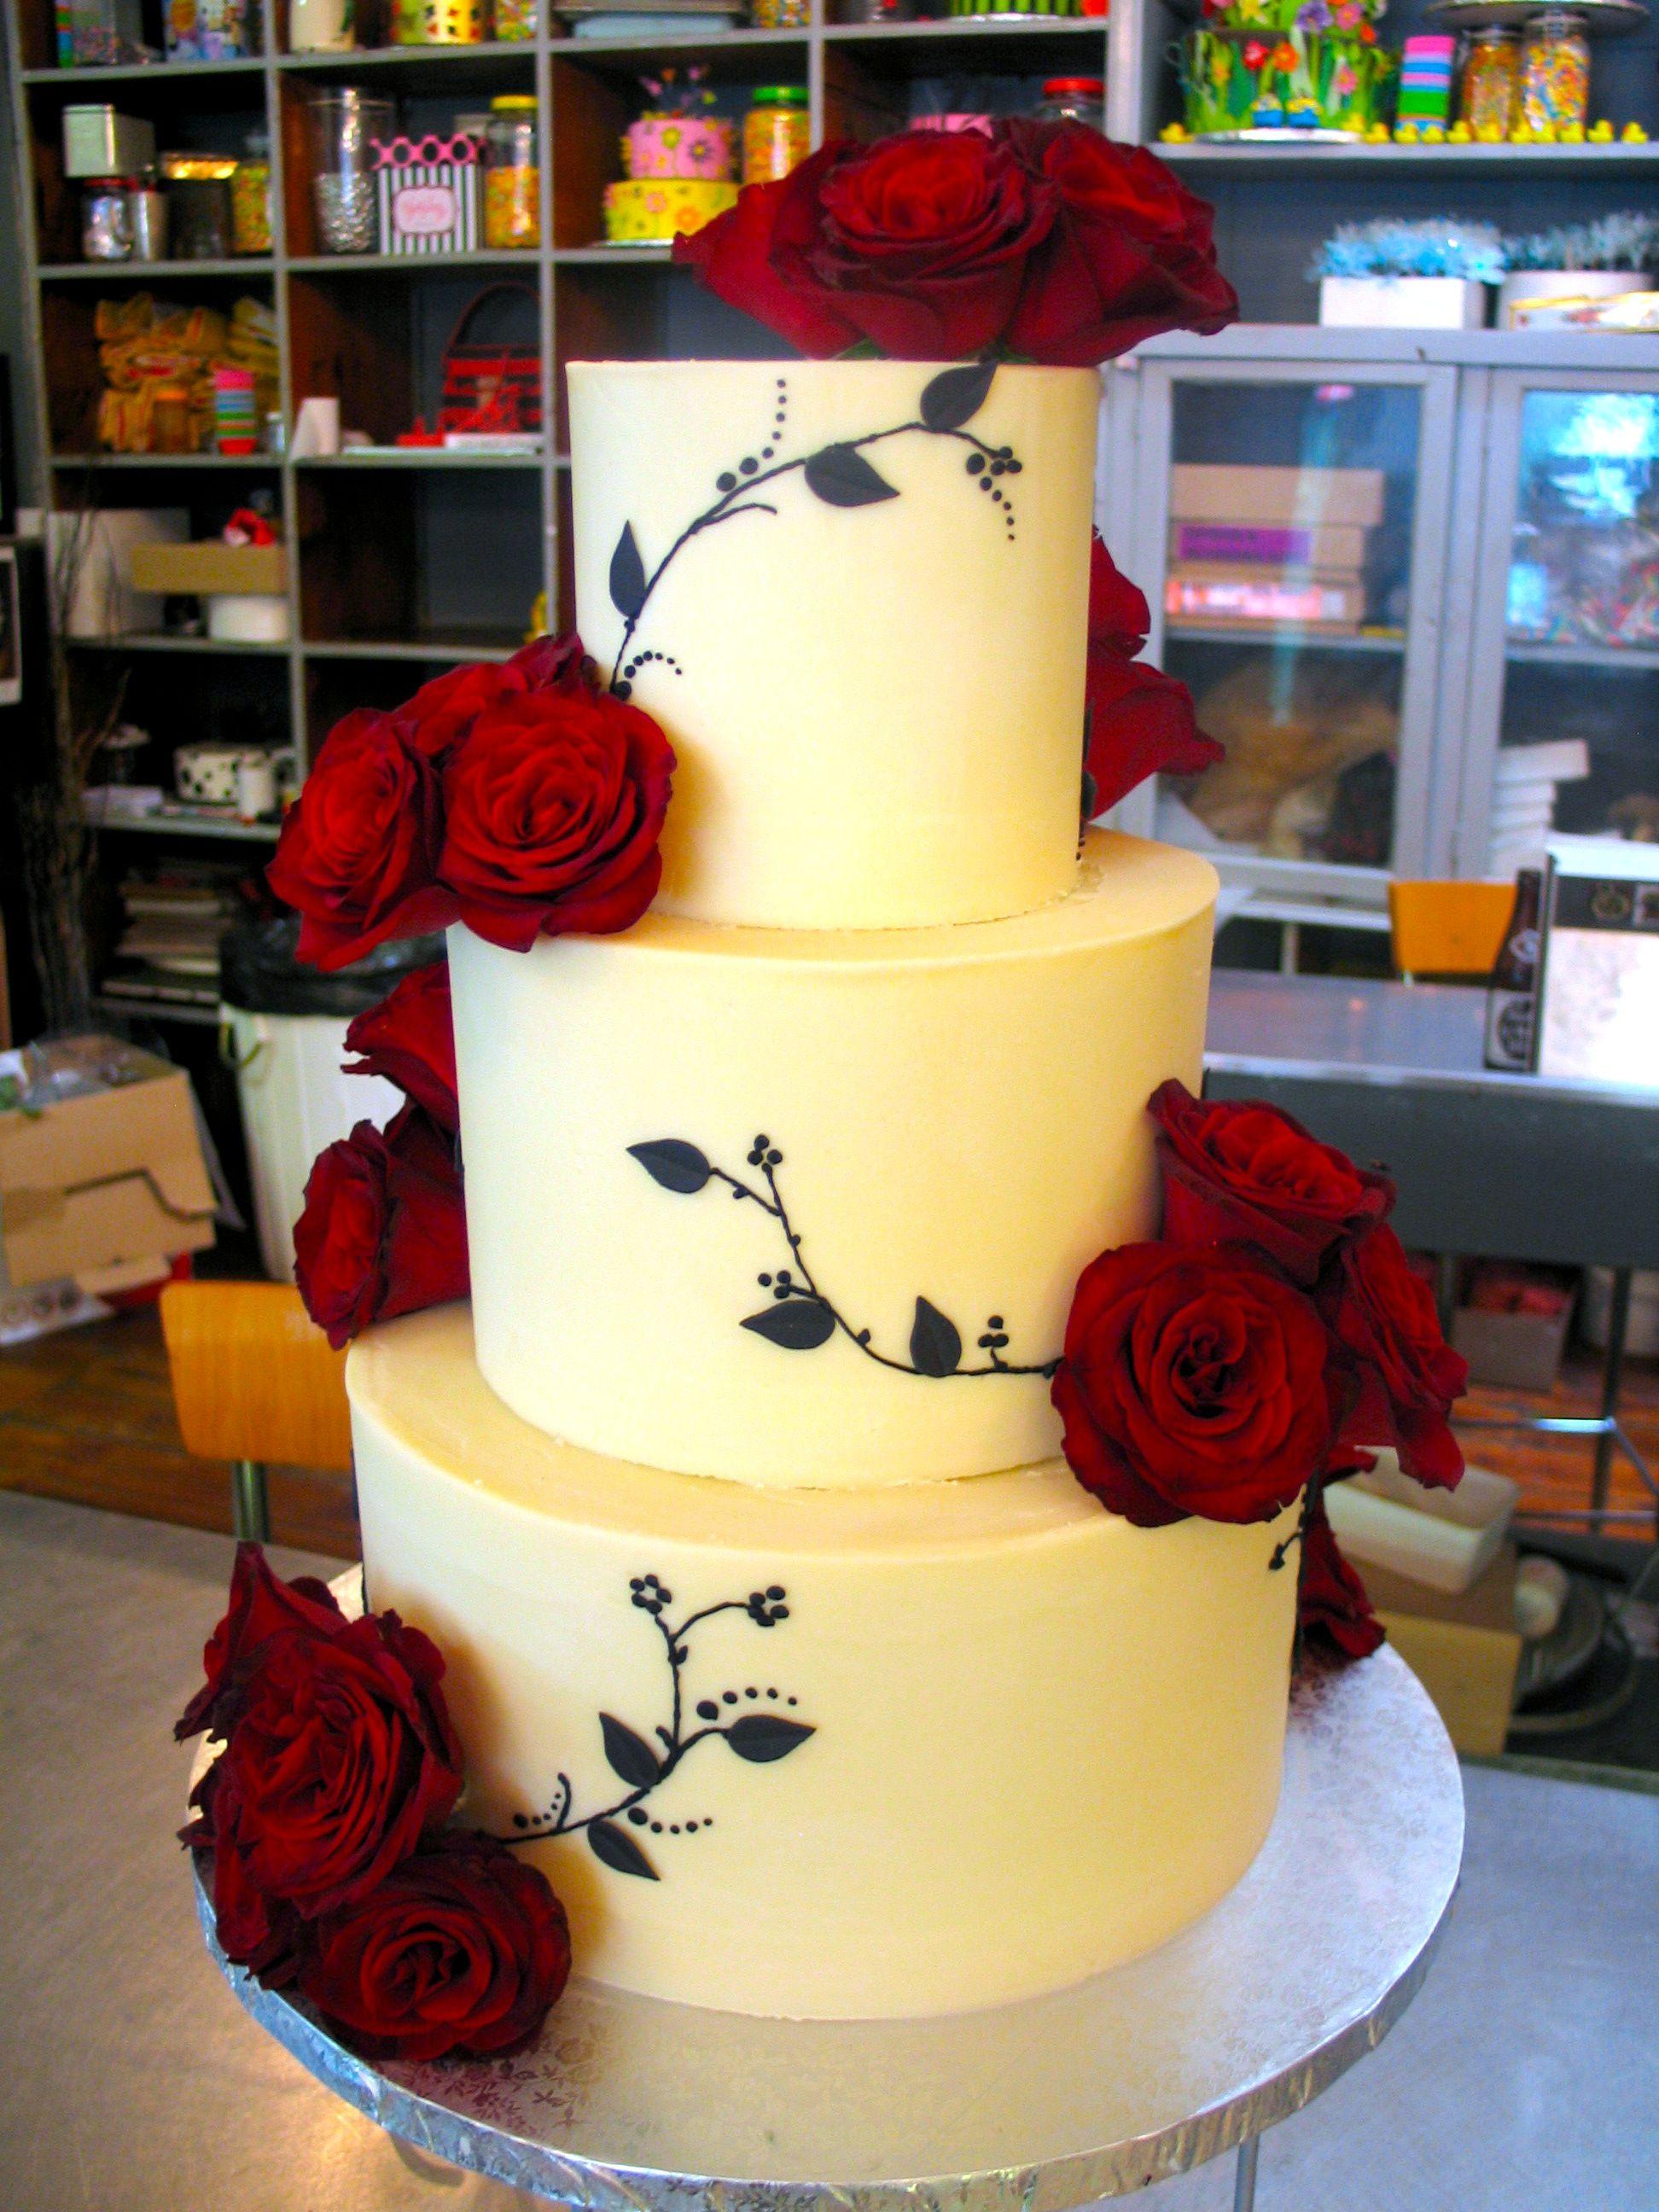 Smooth White Chocolate Ganache Cake with Roses | Chocolate Ganache ...